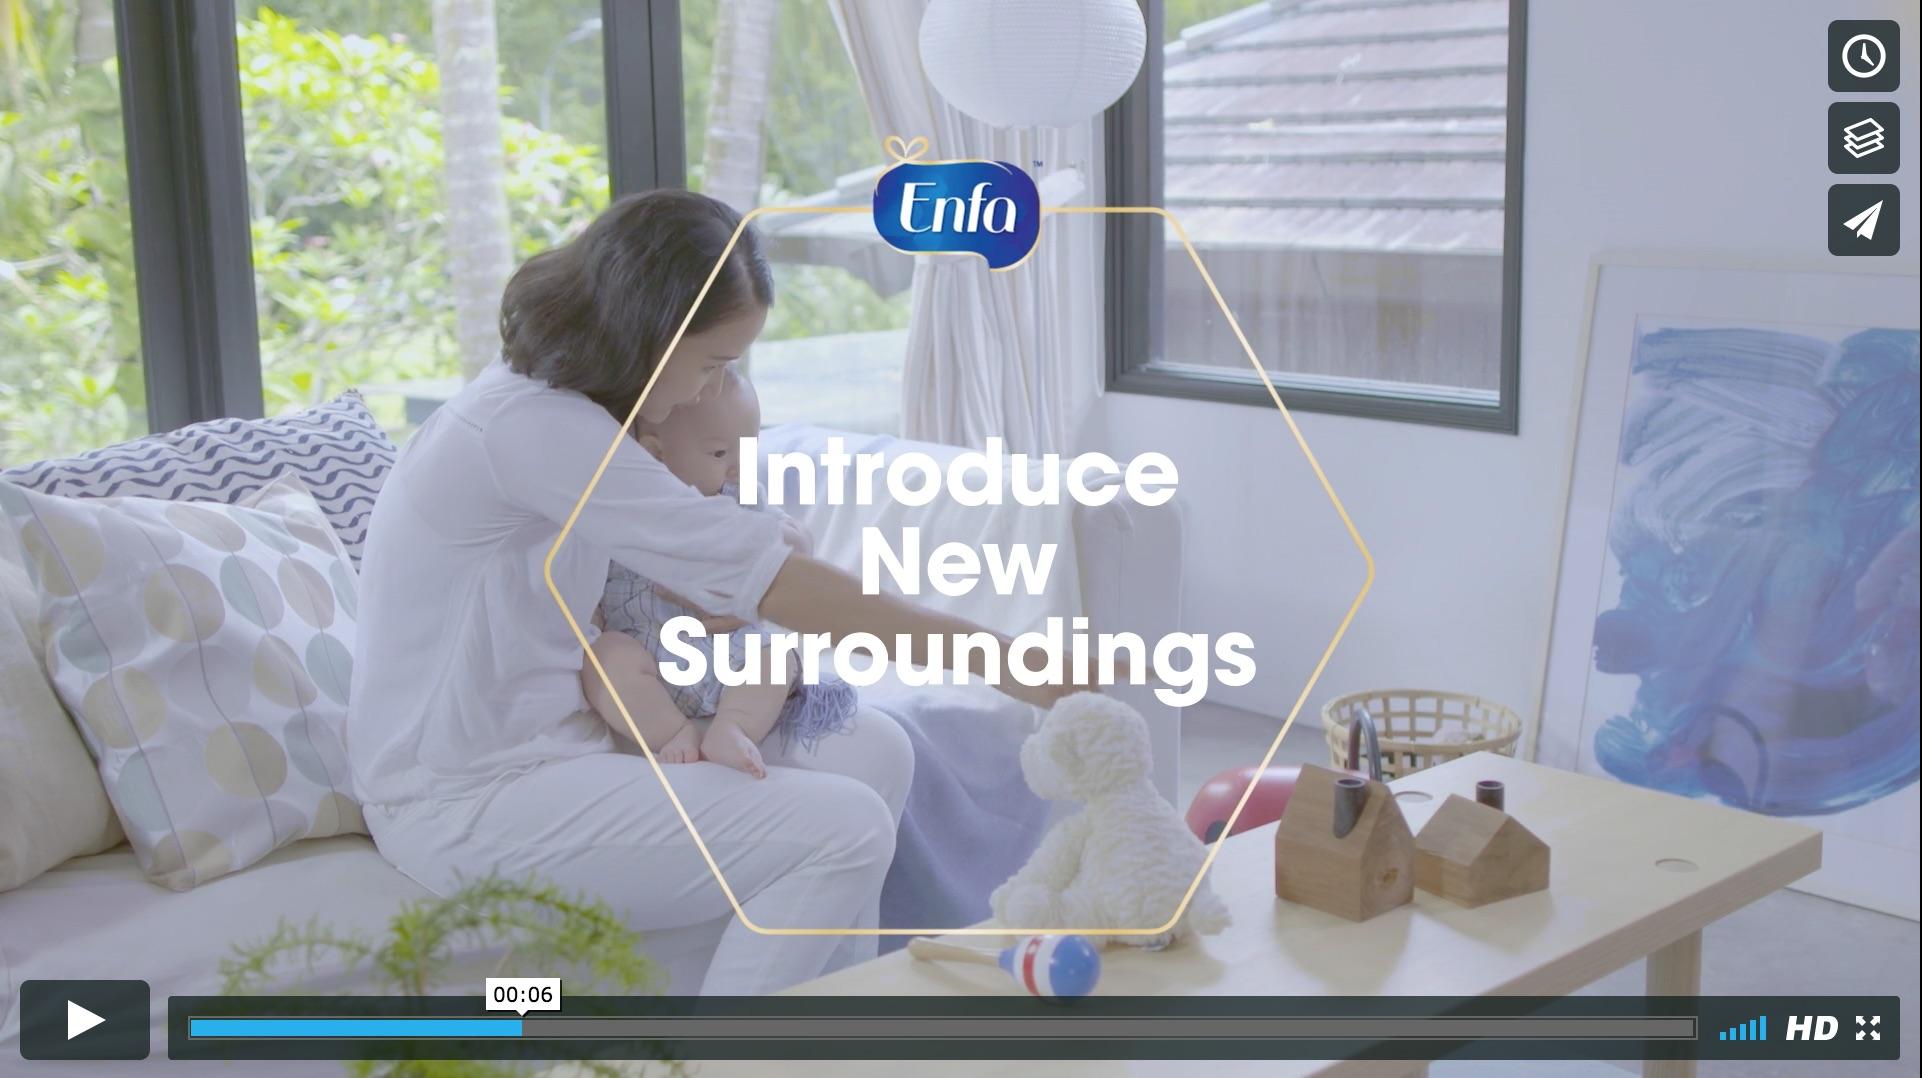 Enfagrow - Click to view videos